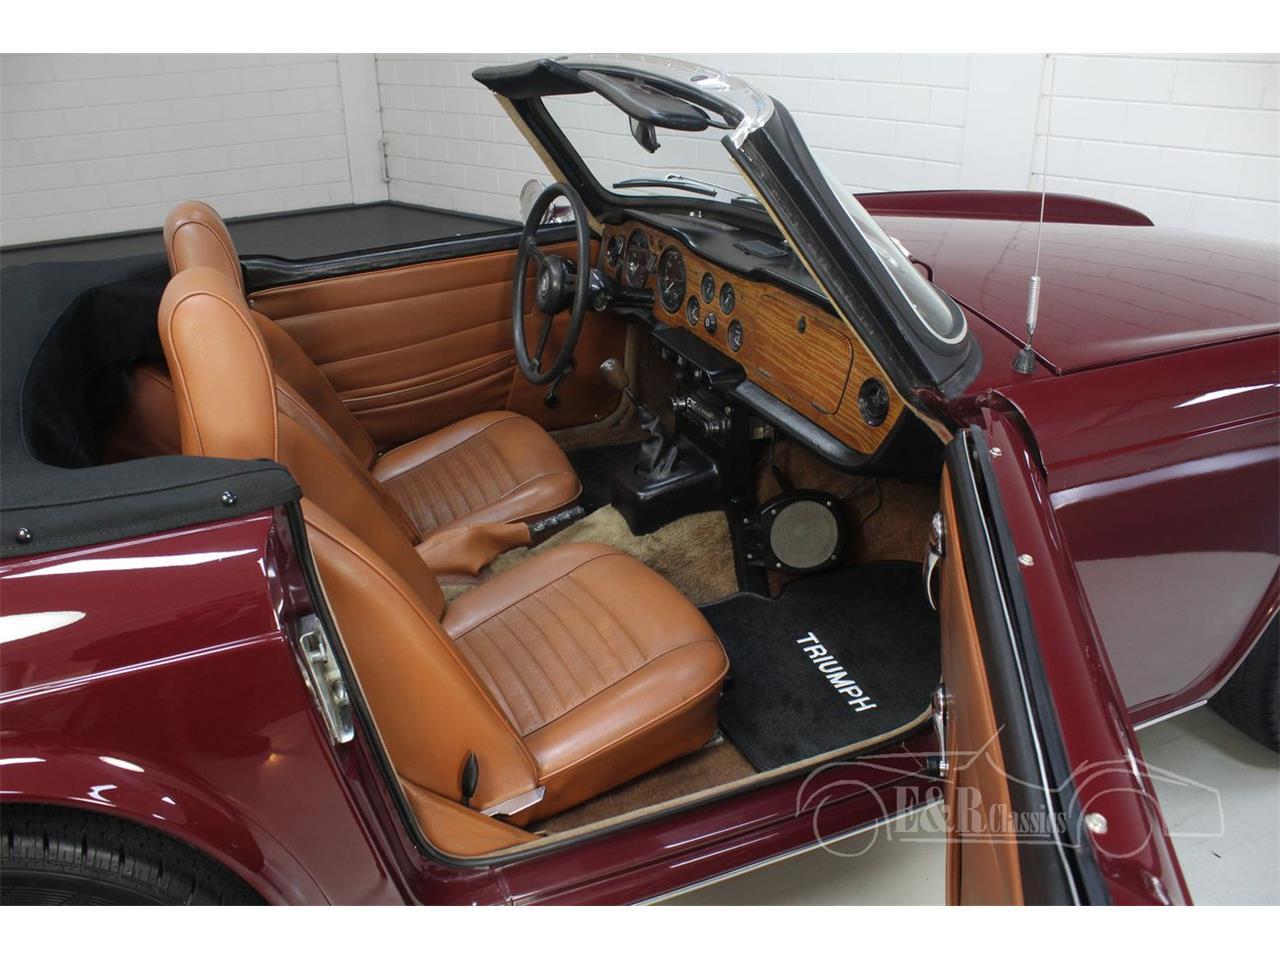 1972 Triumph TR6 (CC-1361122) for sale in Waalwijk, Noord-Brabant